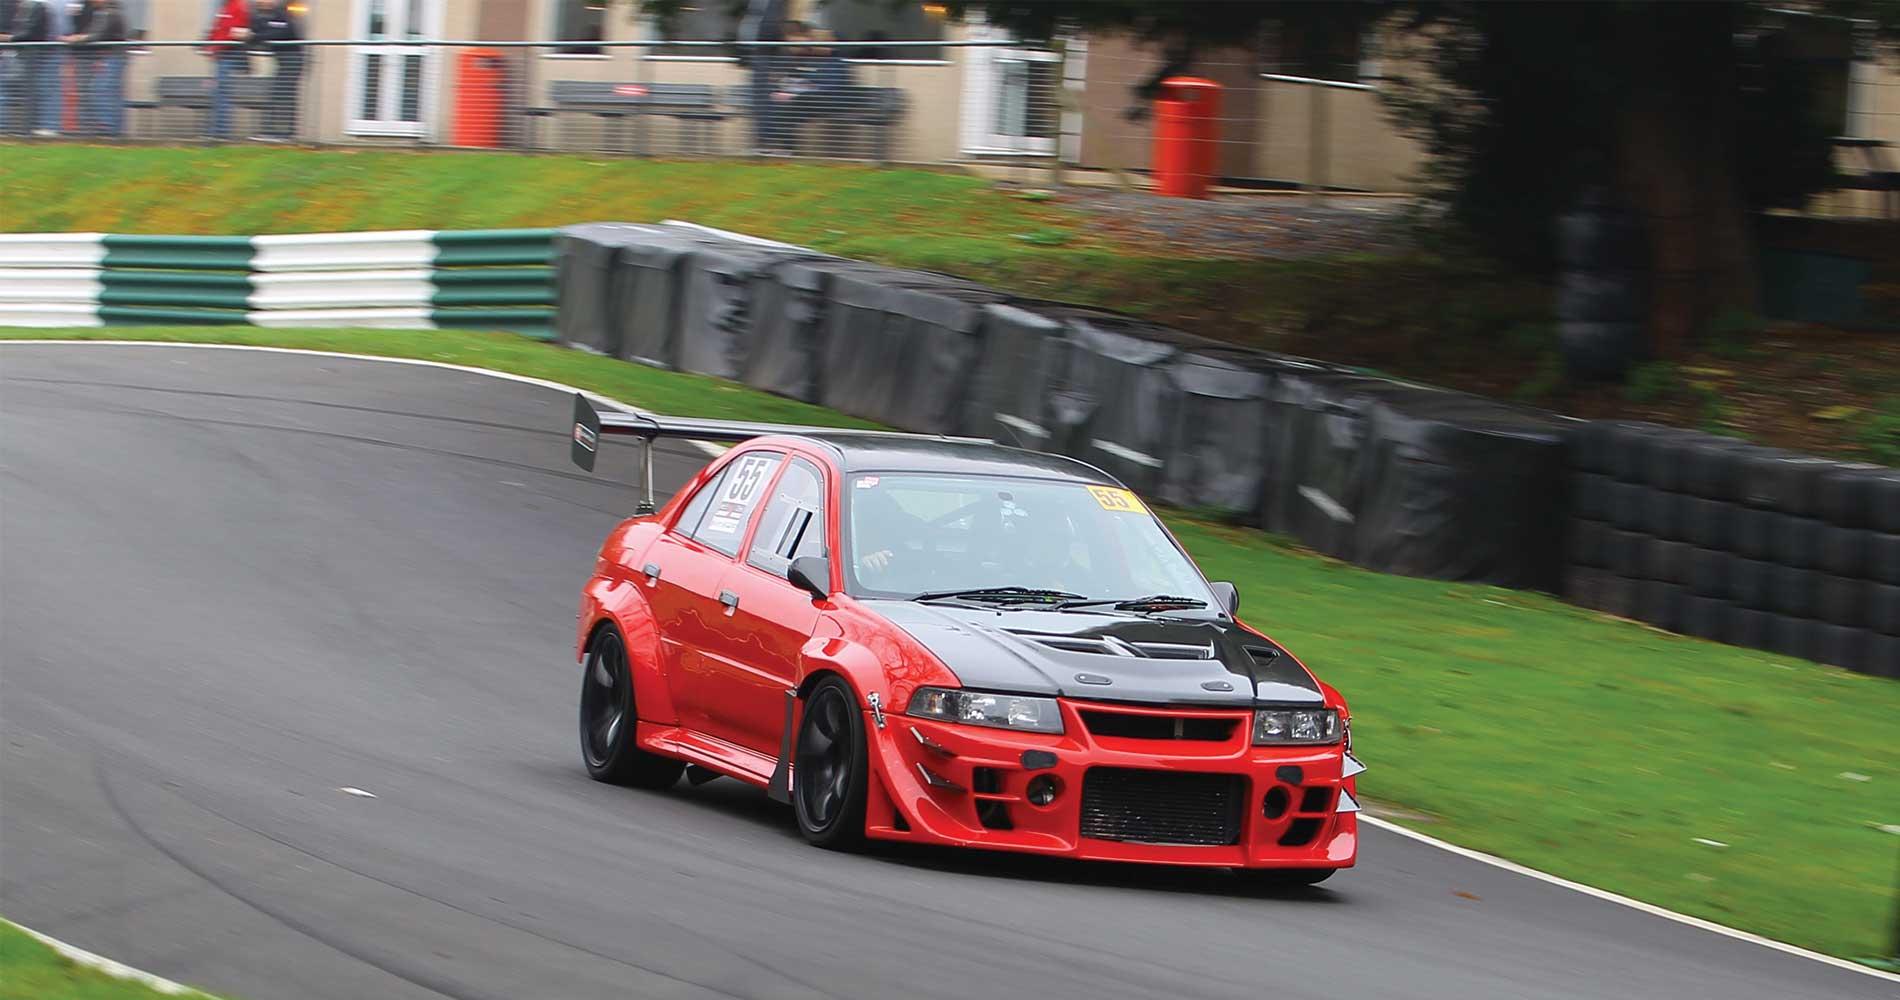 2016-pace-ward-mlr-sprint-series-round-6-cadwell-park-report-motorsportdays-test-days-9